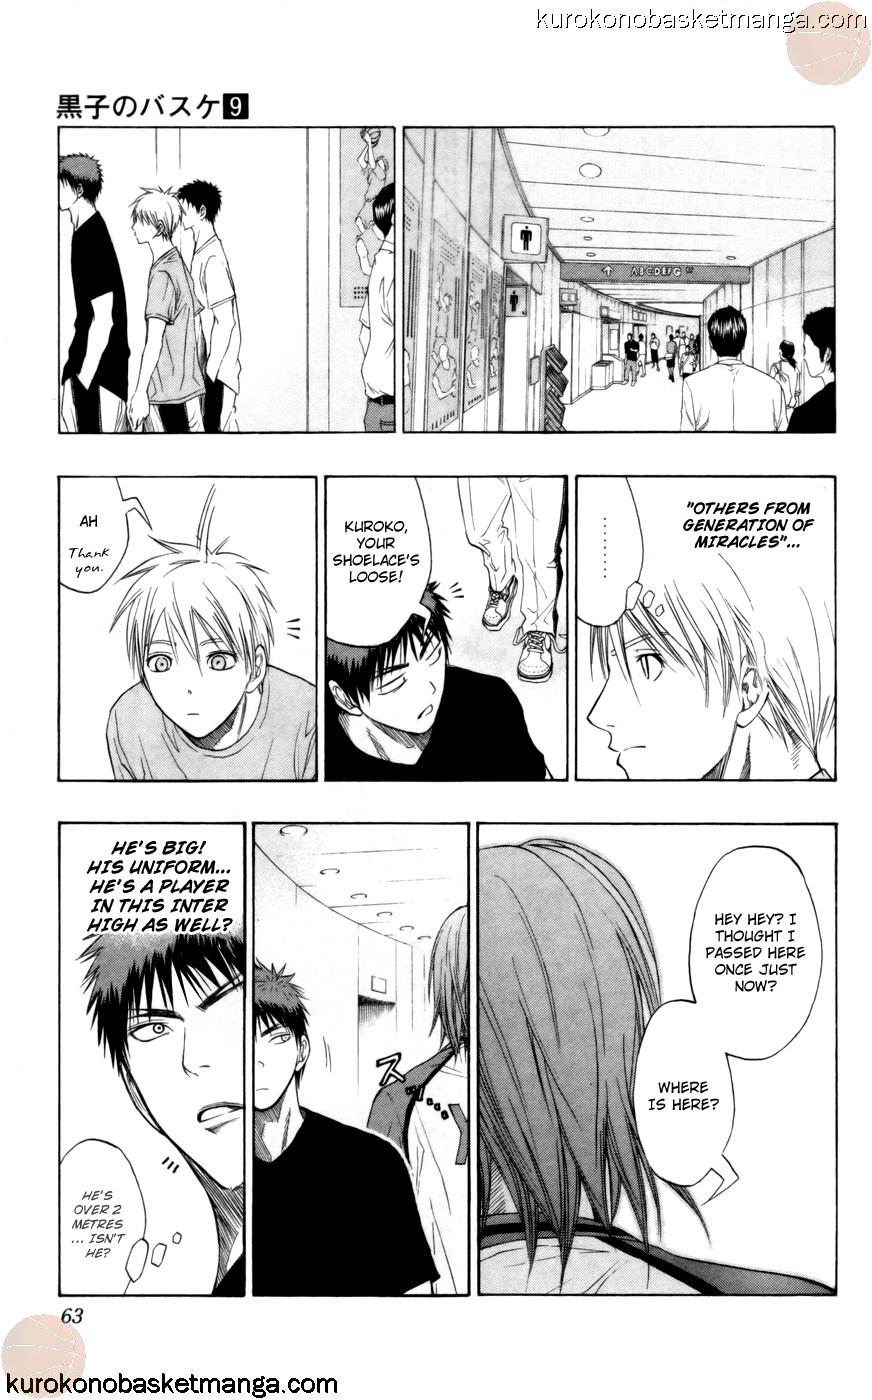 Kuroko no Basket Manga Chapter 73 - Image 17